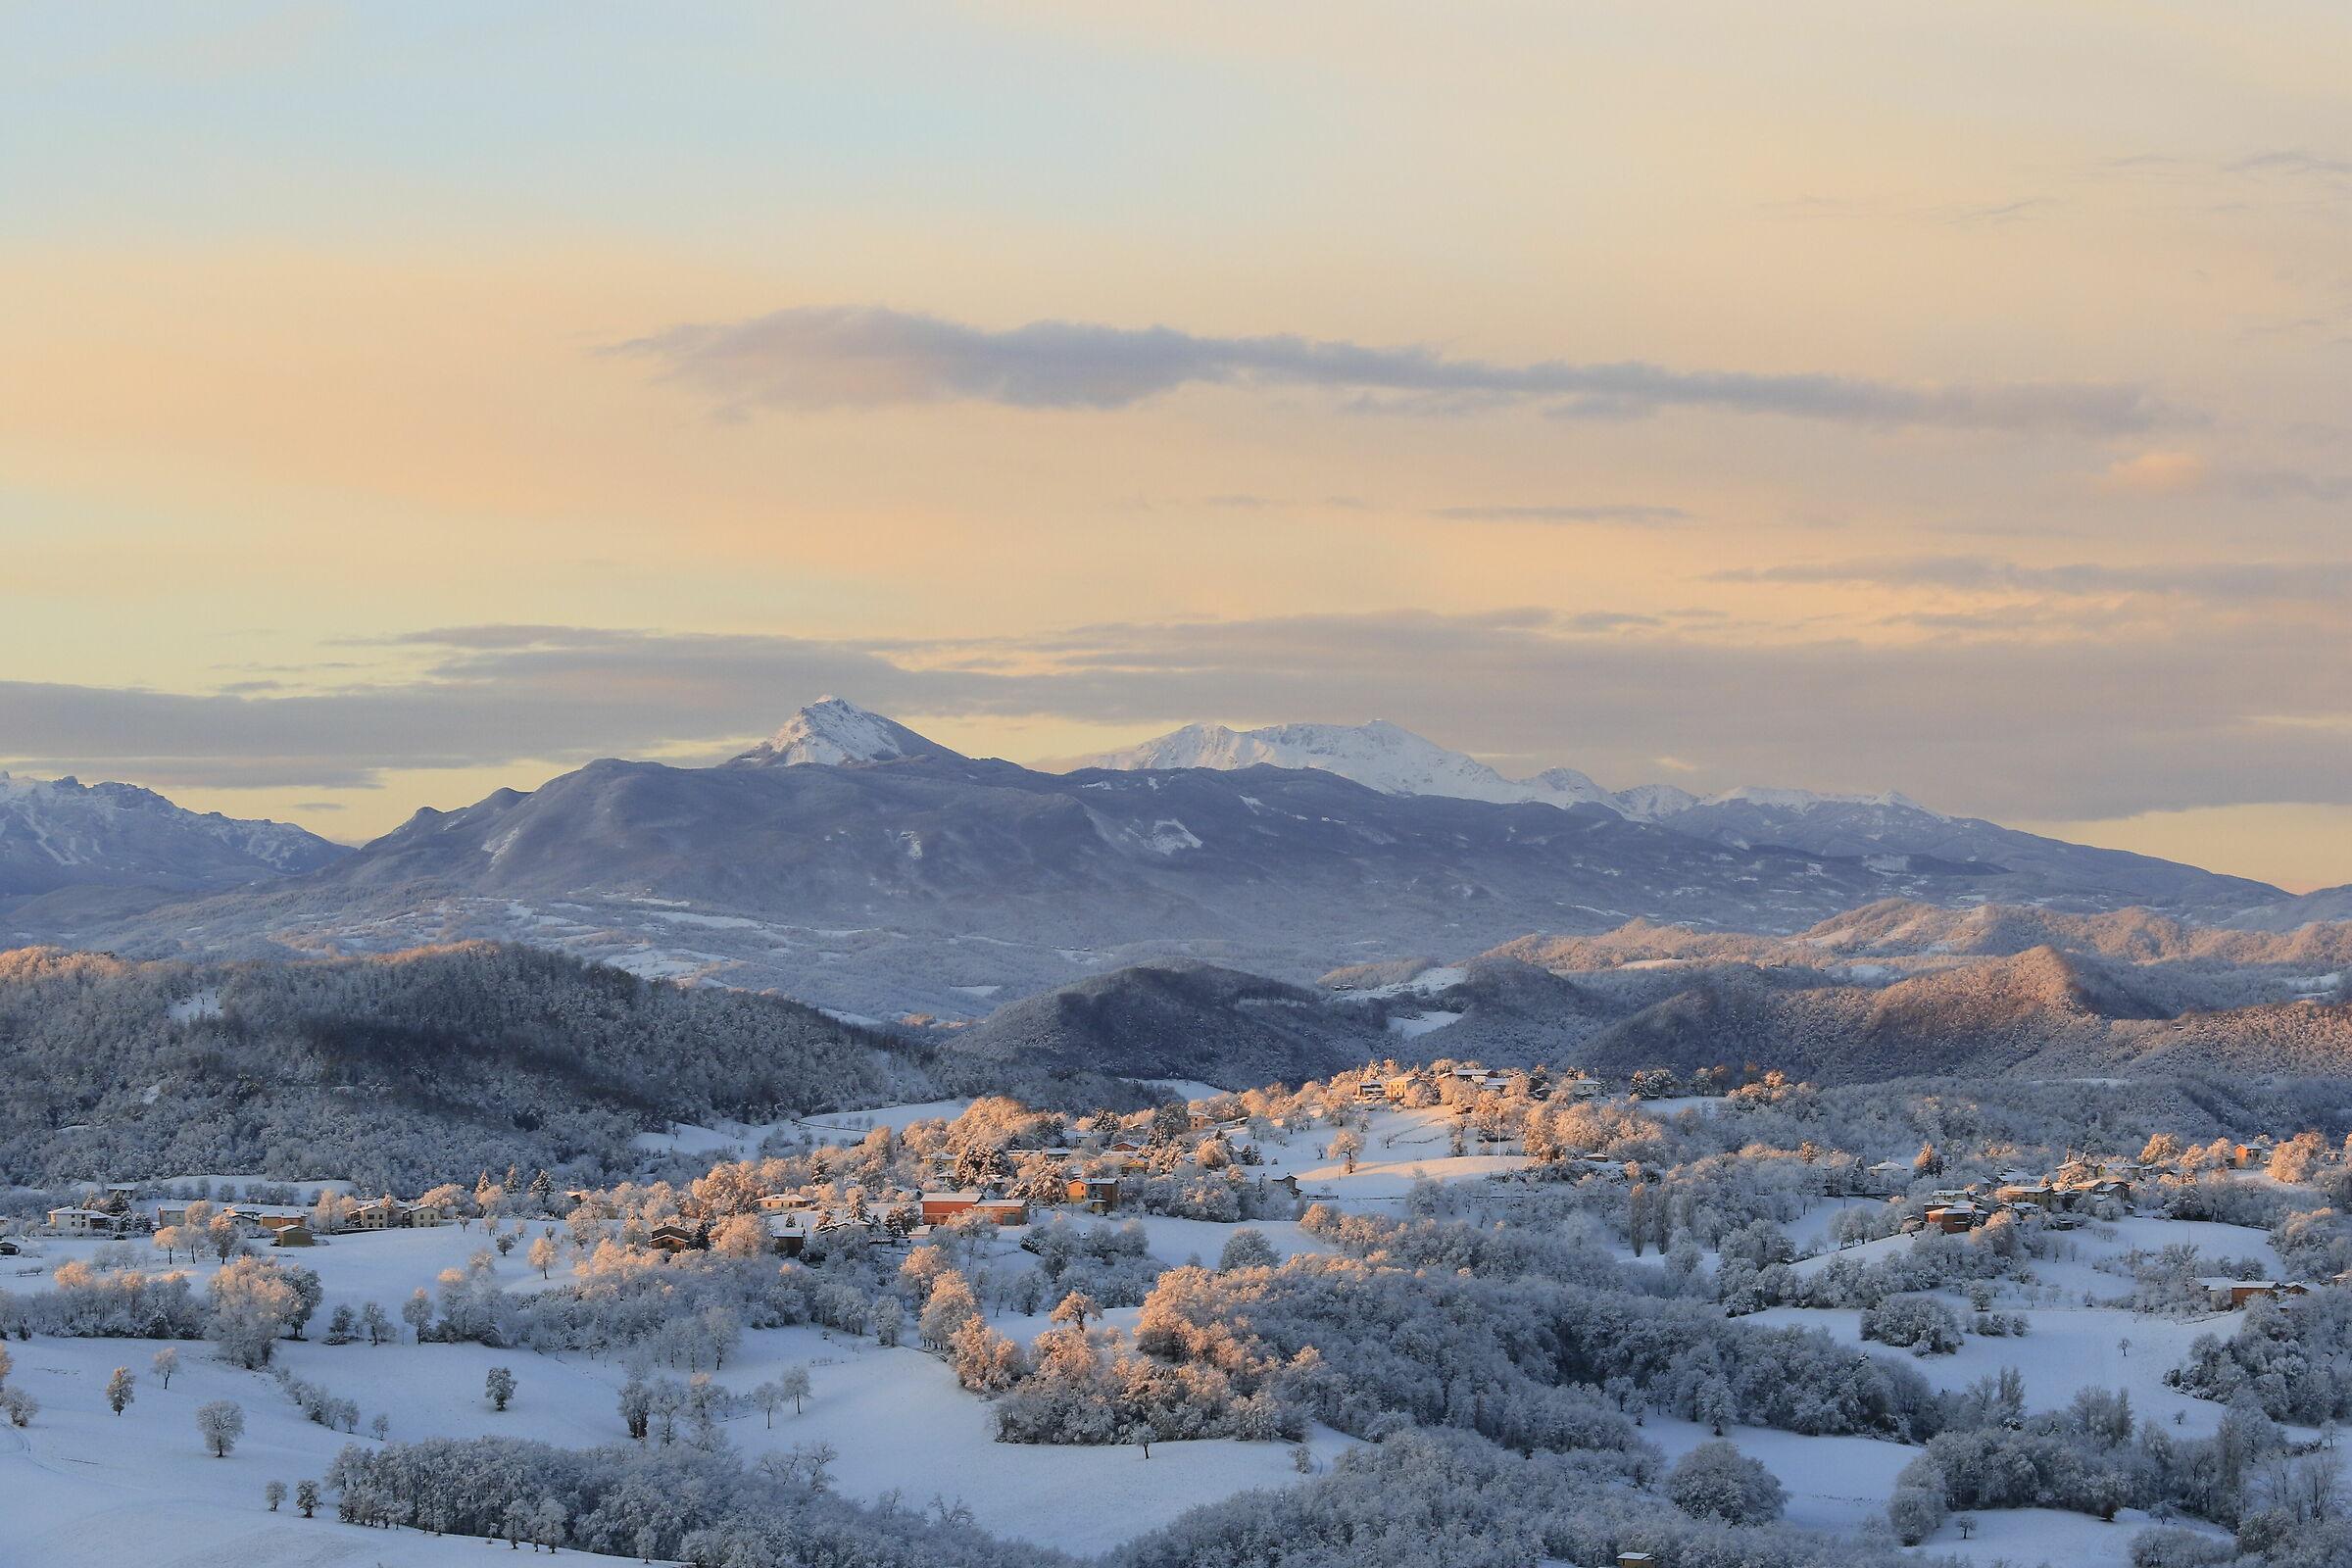 A wonderful morning in the Reggio Apennines...